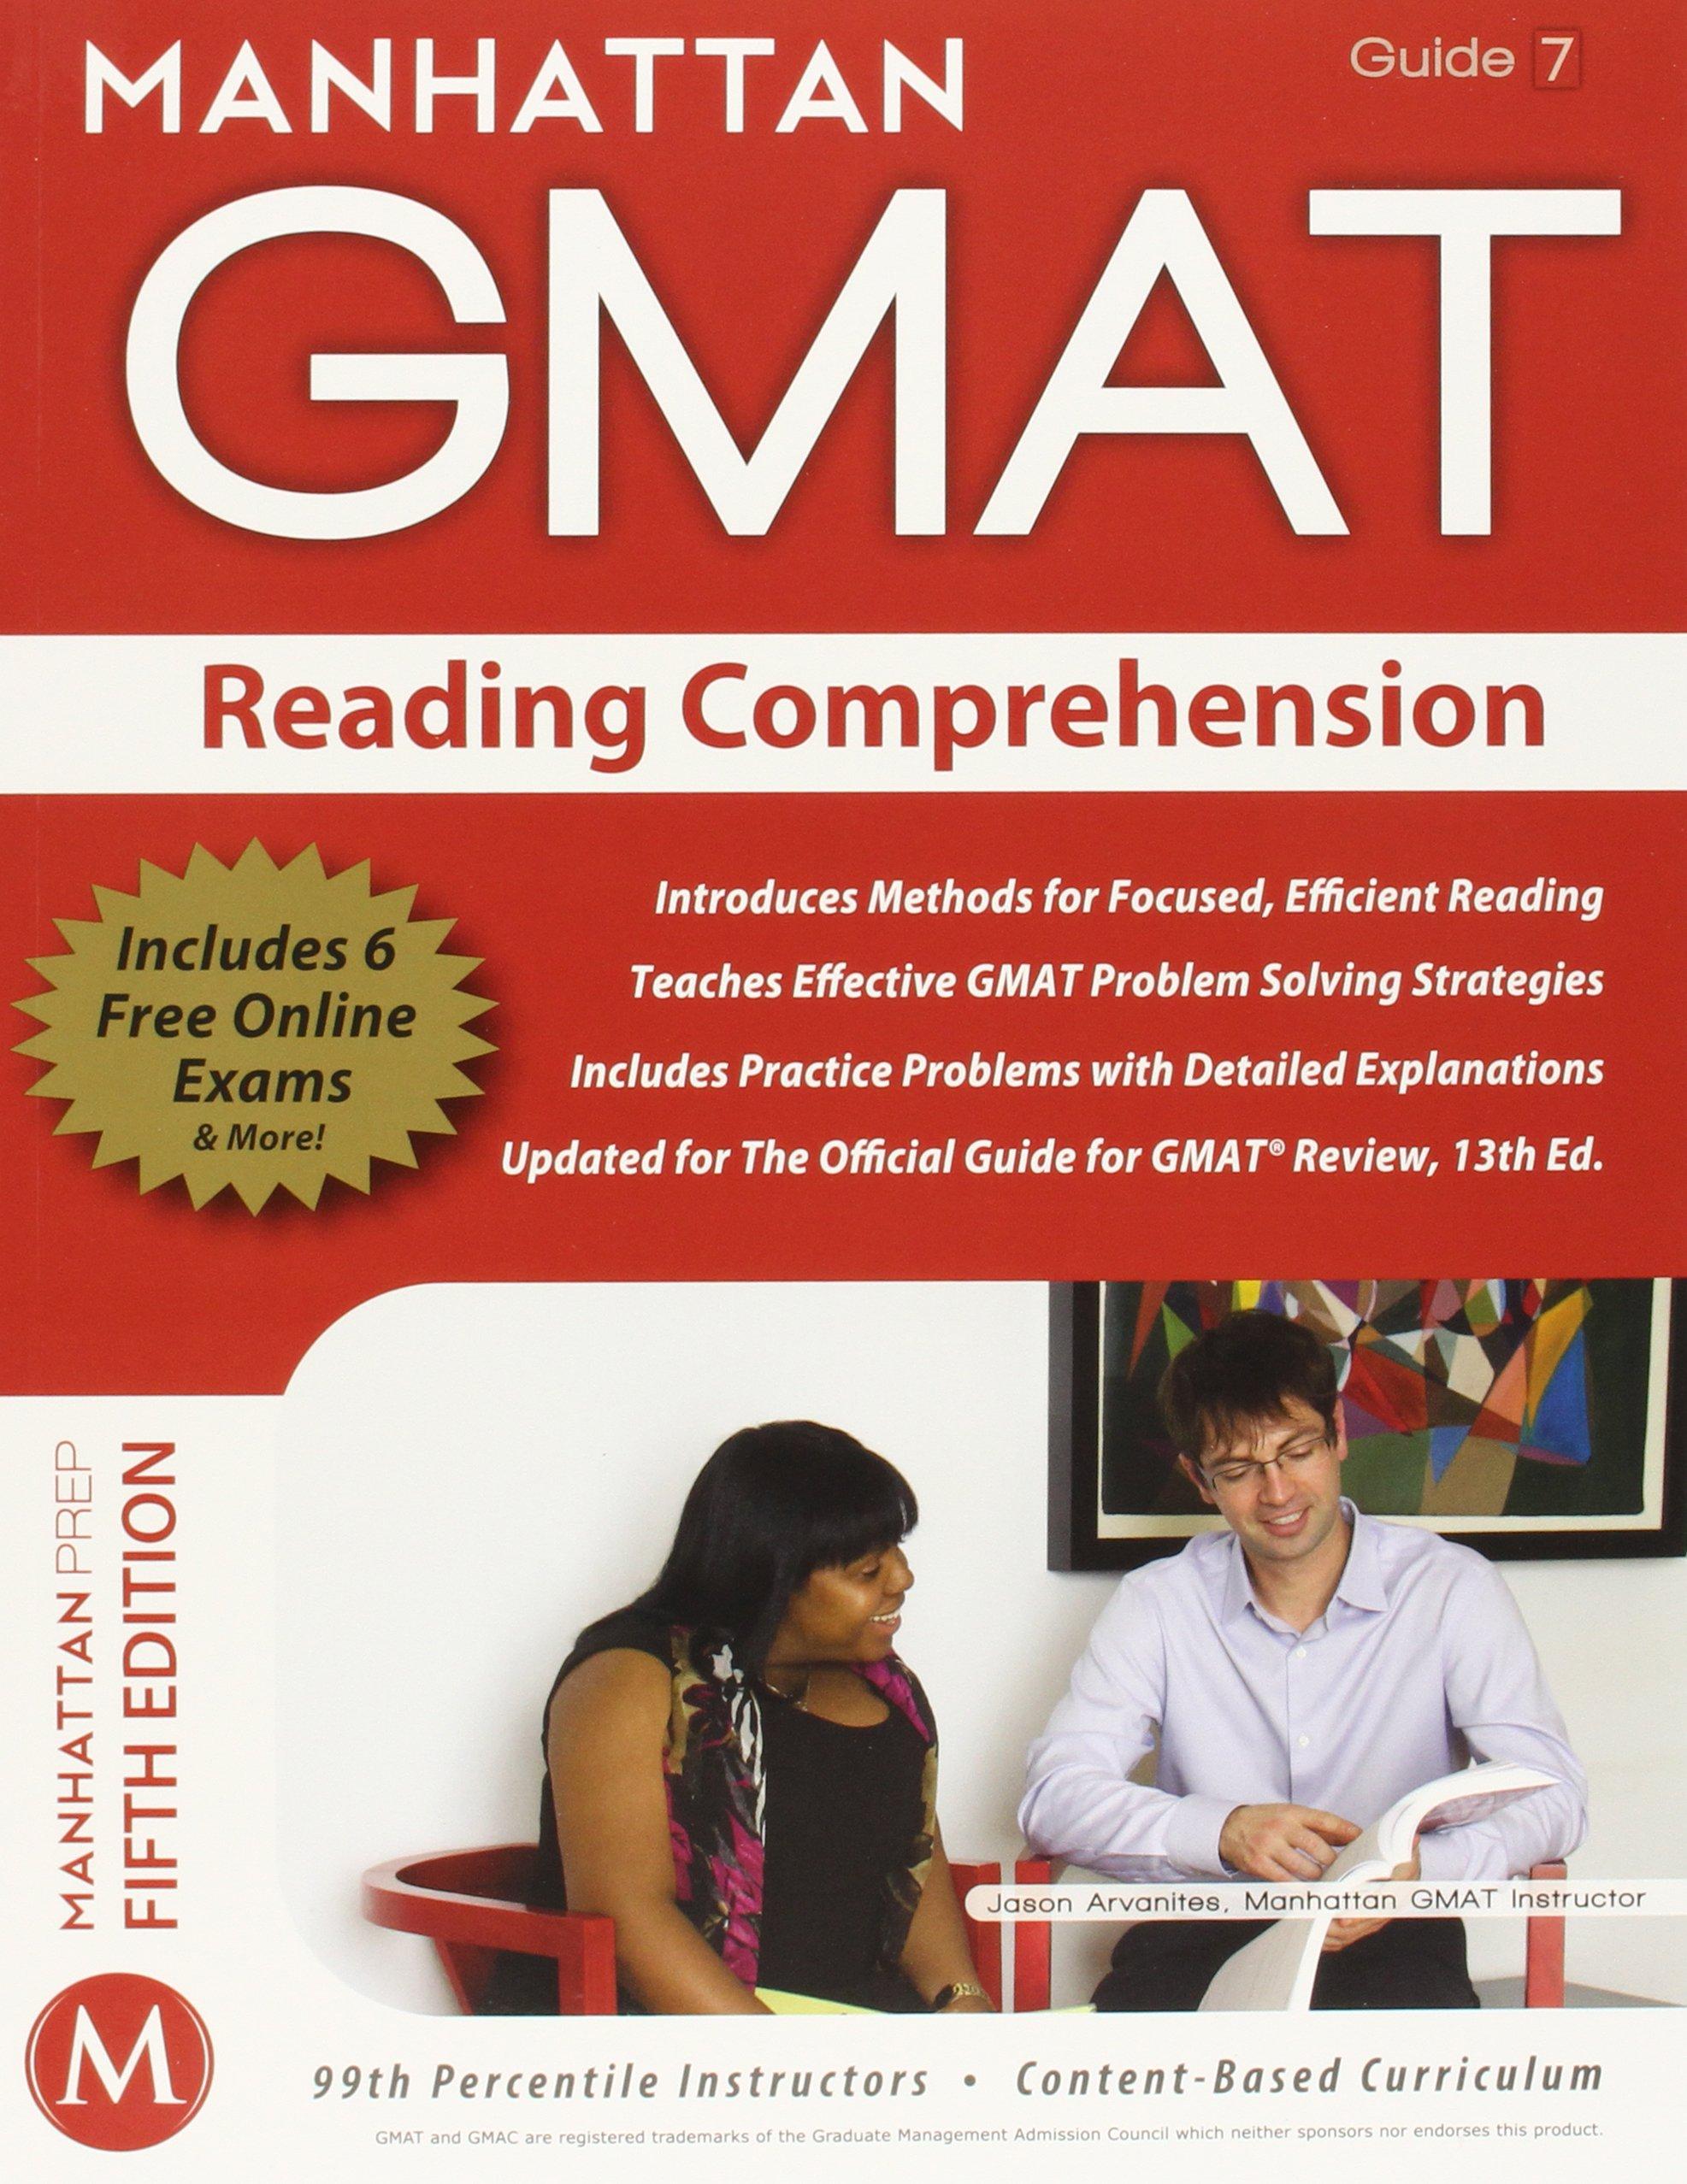 Manhattan GMAT Verbal Strategy Guide Set, 5th Edition: Manhattan GMAT:  9781935707776: Books - Amazon.ca